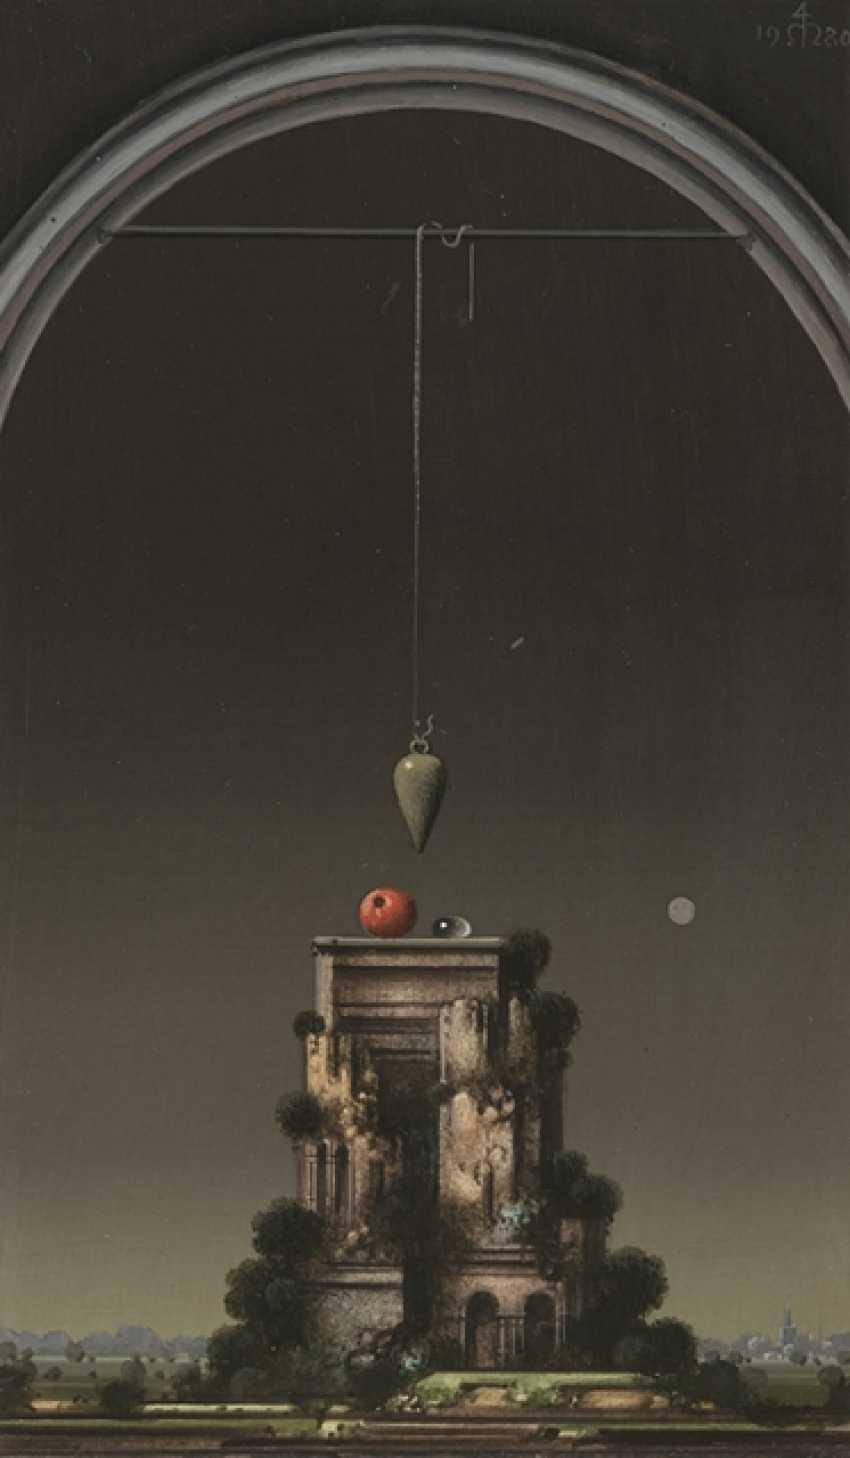 Maass, Hans - The Pendulum - photo 1